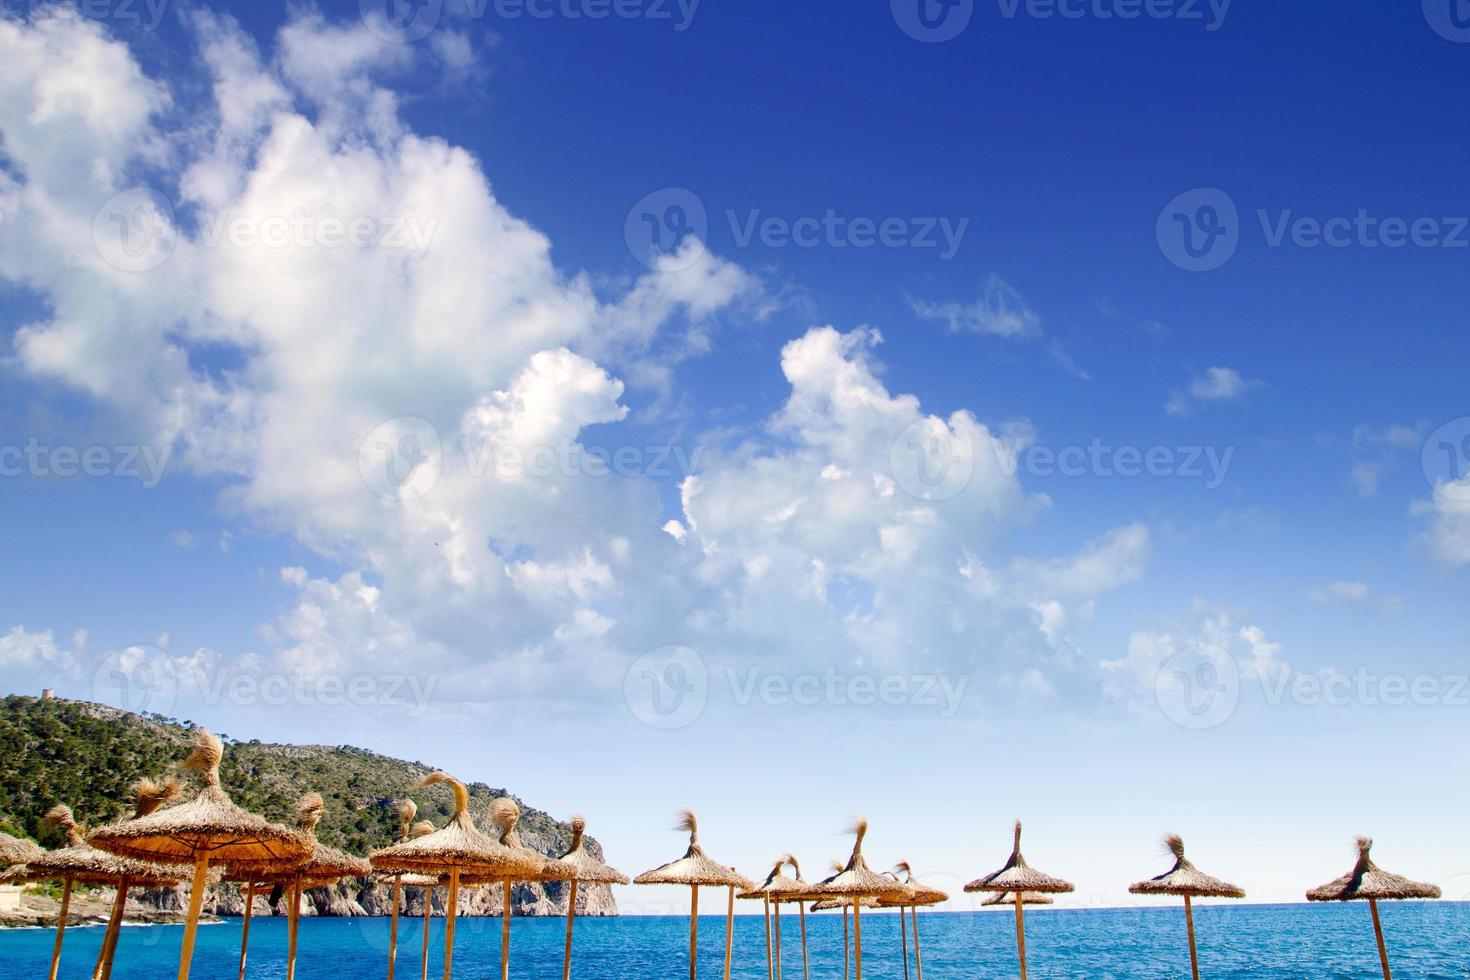 camp de mar i andratx från Mallorca Baleariska ön foto